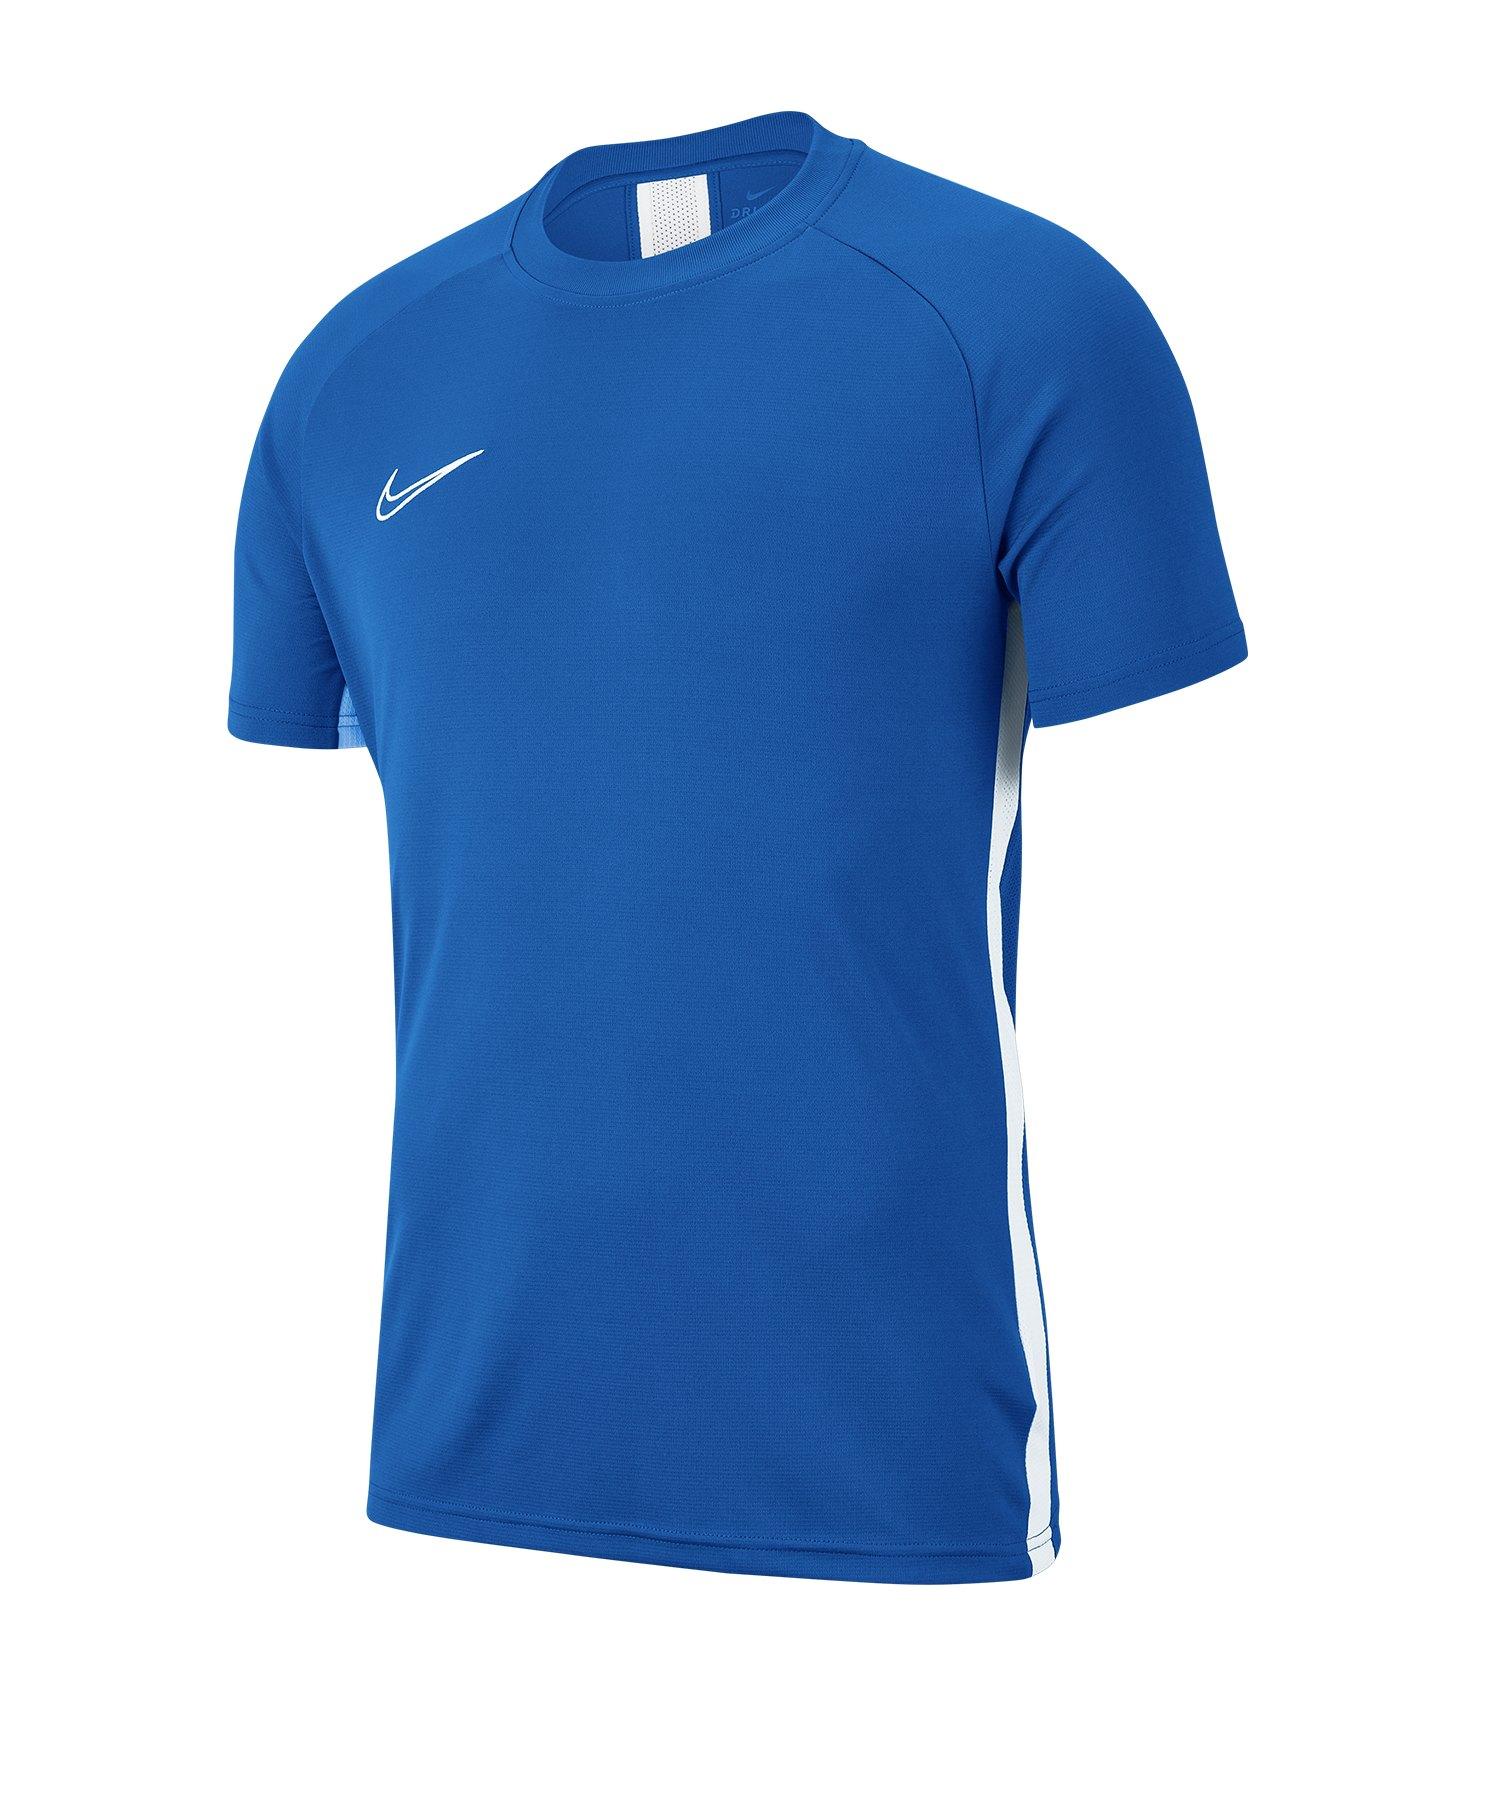 Nike Academy 19 Dri-FIT T-Shirt Kids Blau F463 - Blau